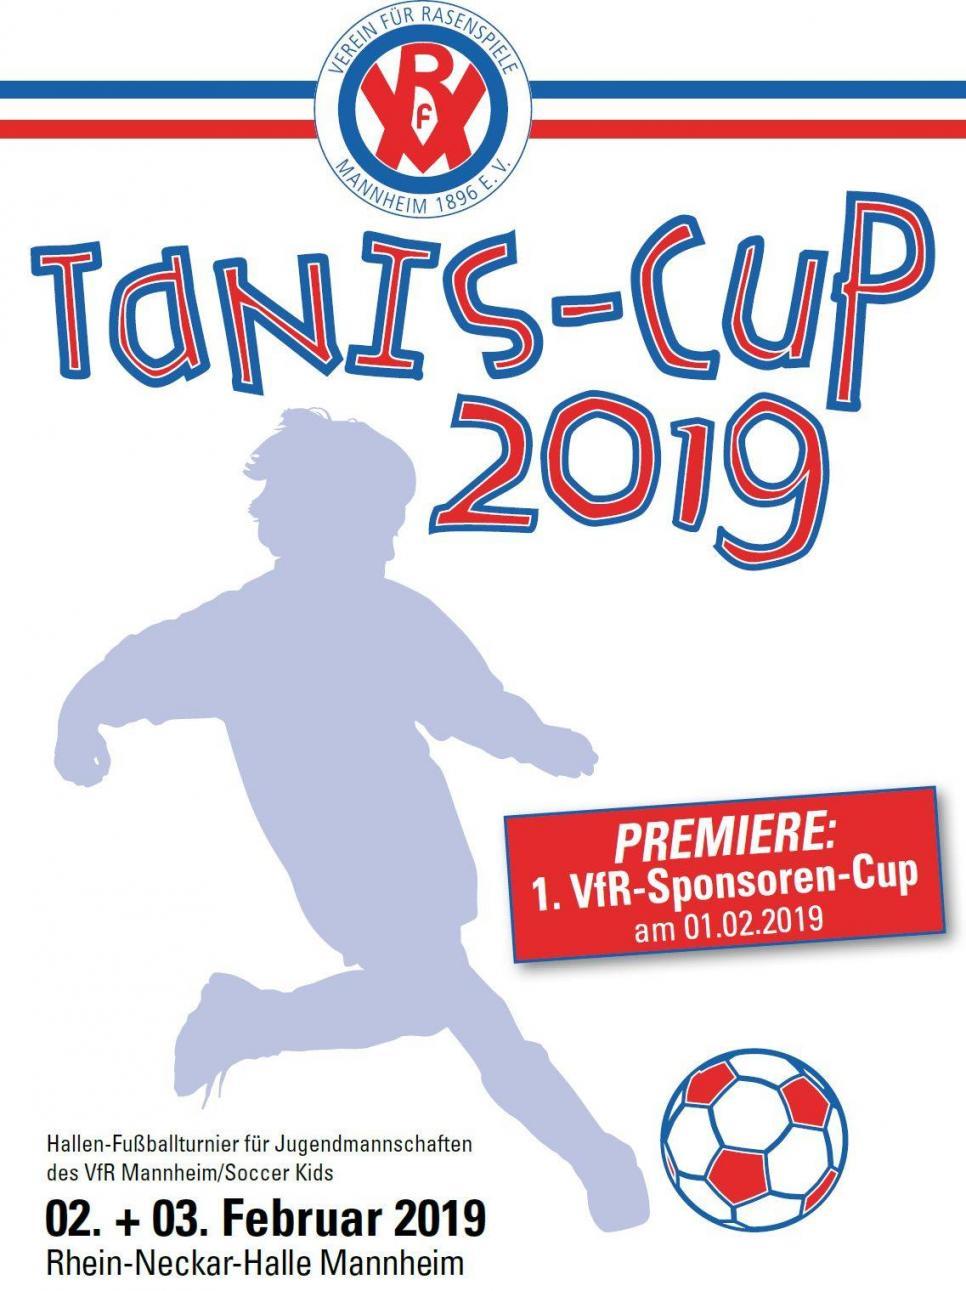 Sport Kurier Mannheim Rund 60 Teams Am Start Beim Tanis Cup 2019